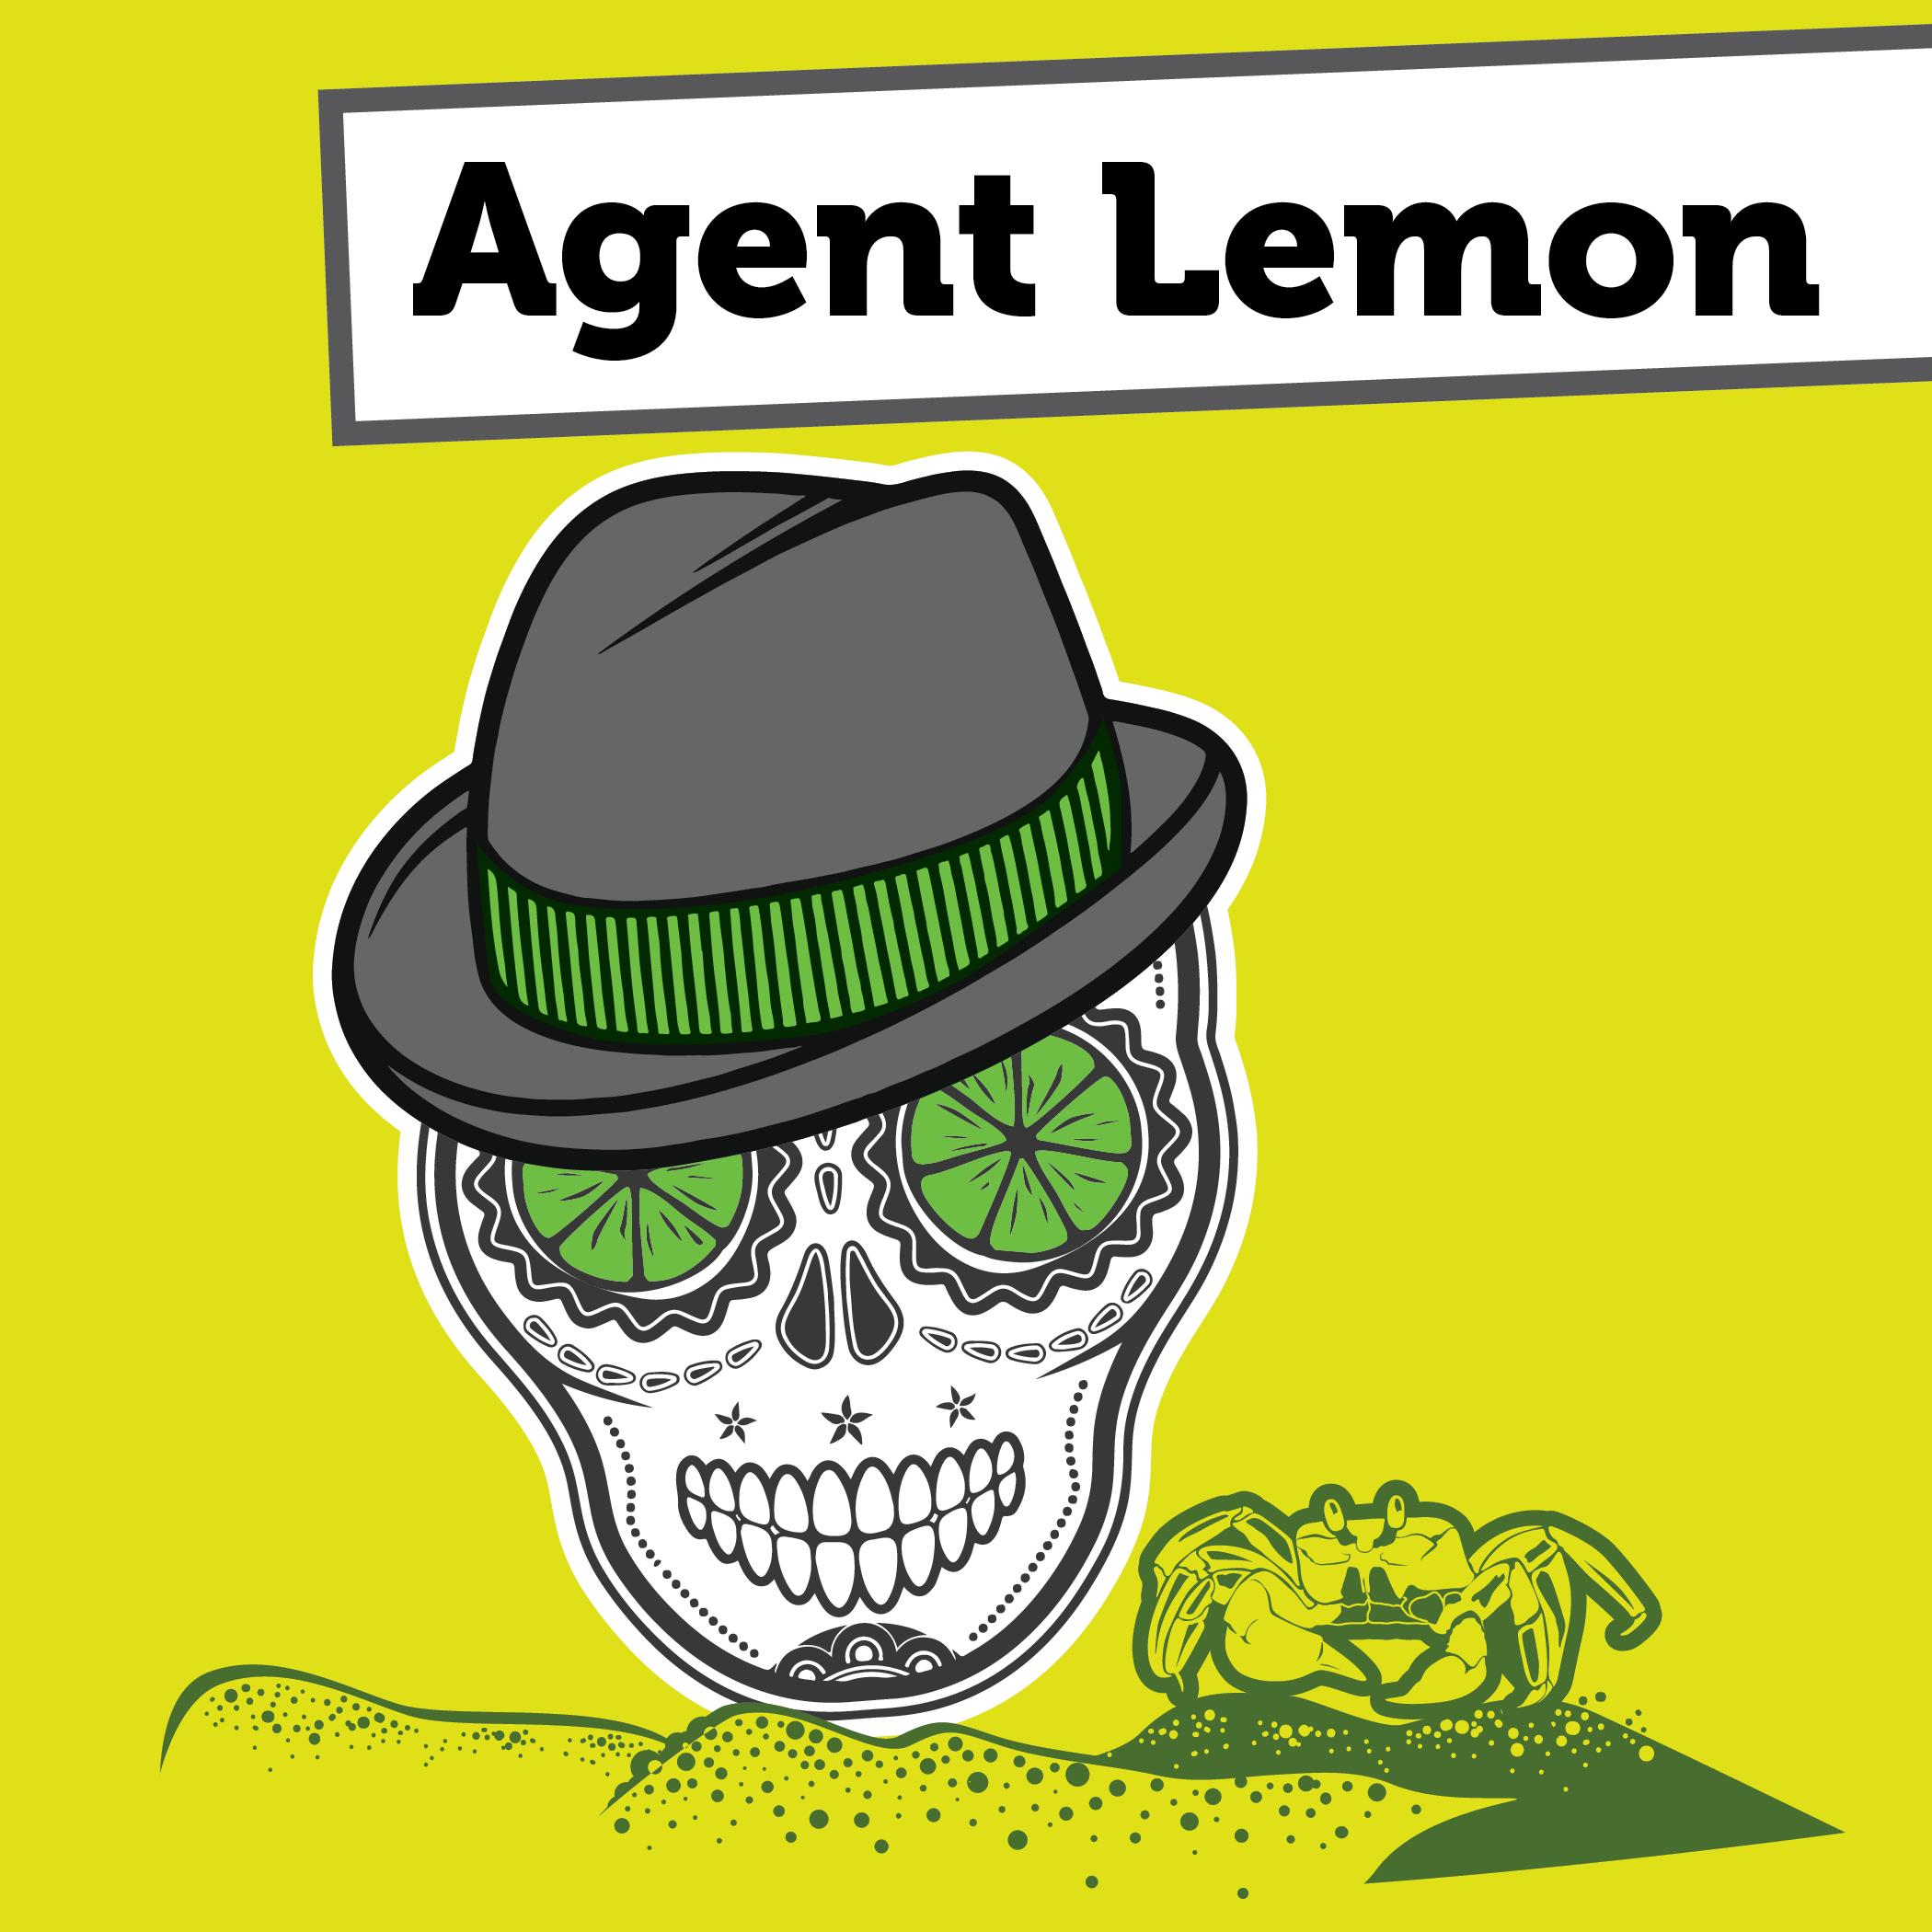 Agent Lemon